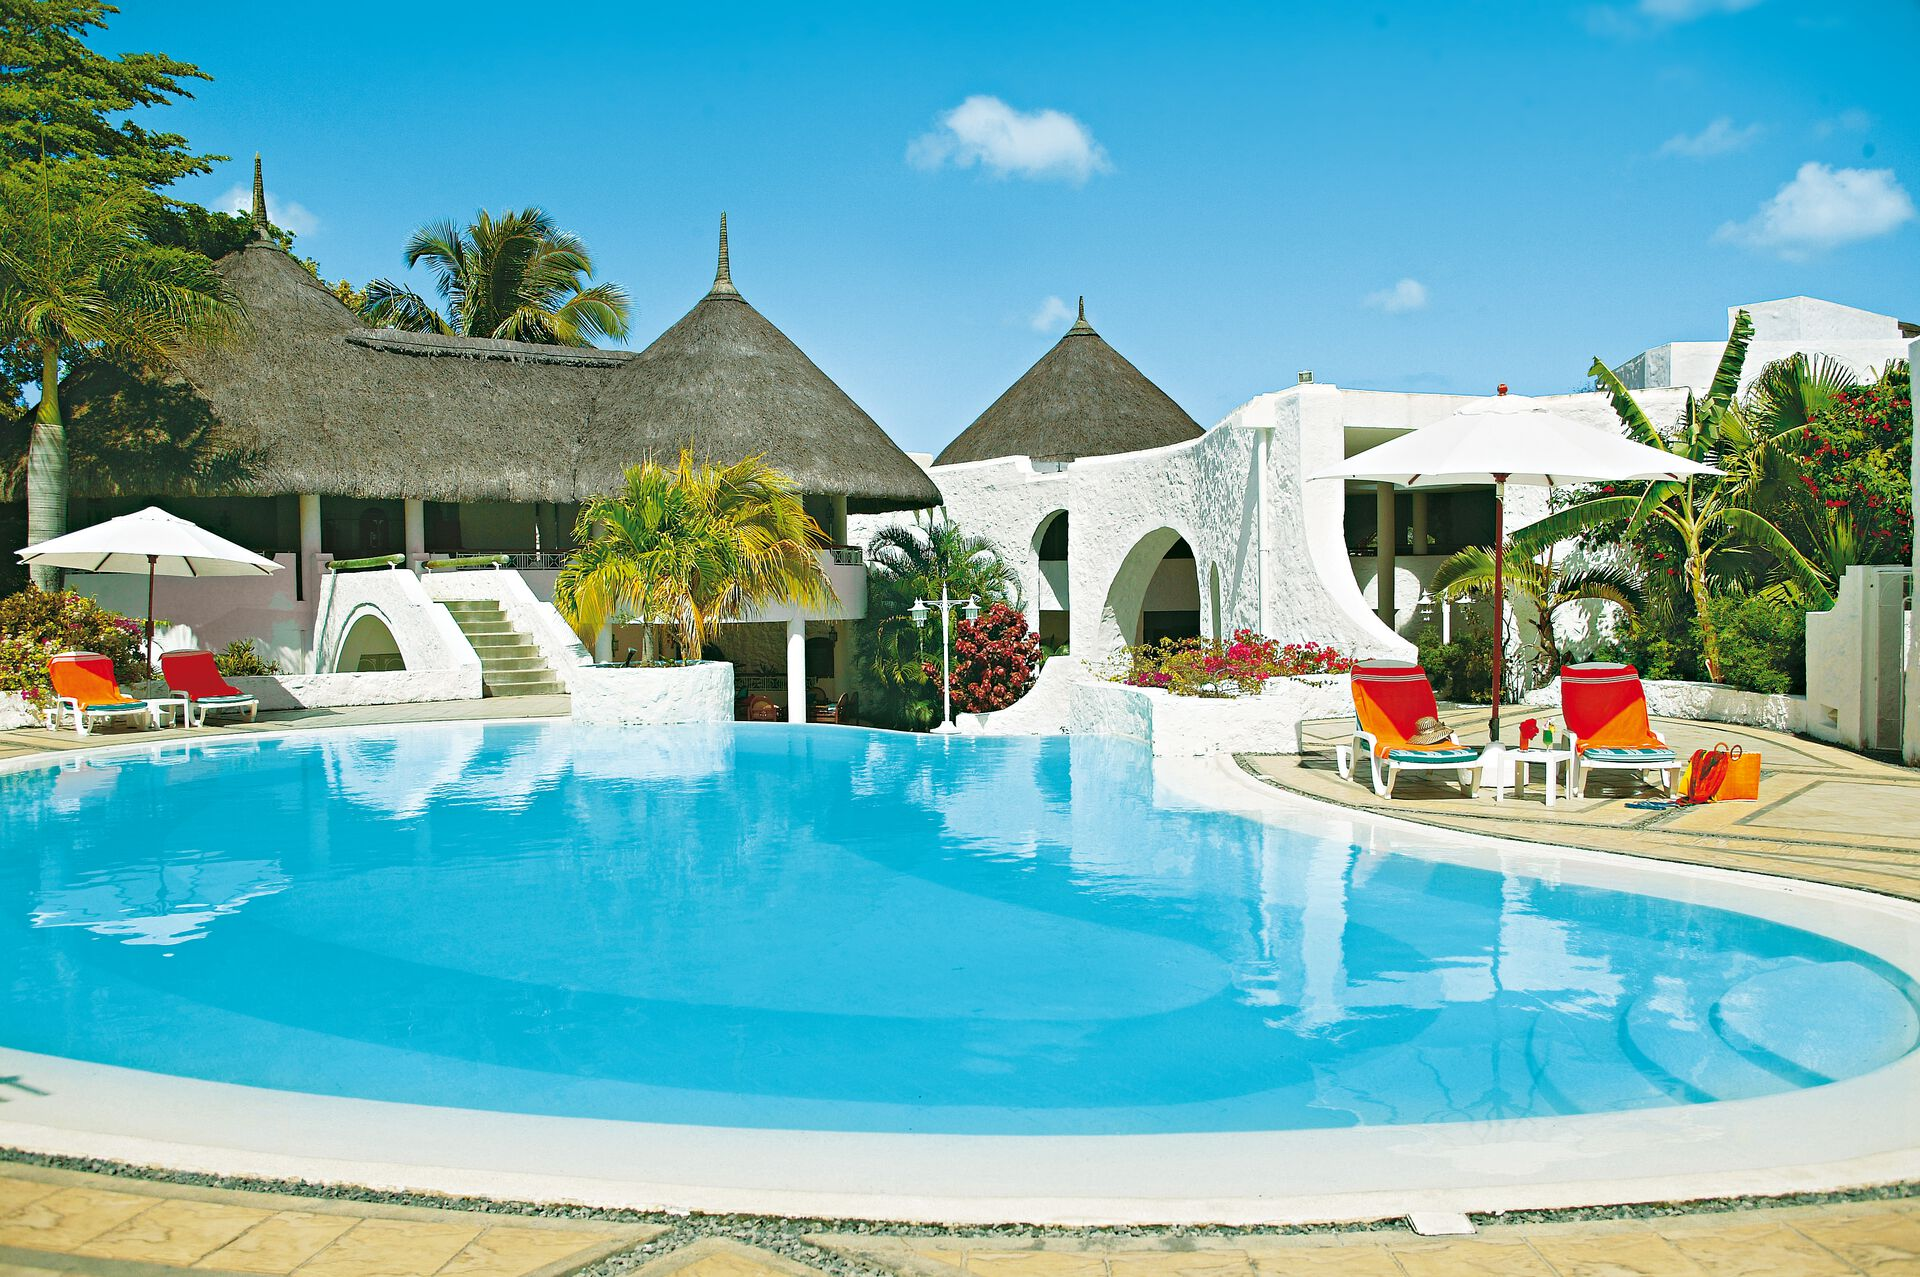 Maurice - Ile Maurice - Hôtel Casuarina Resort & Spa 4*